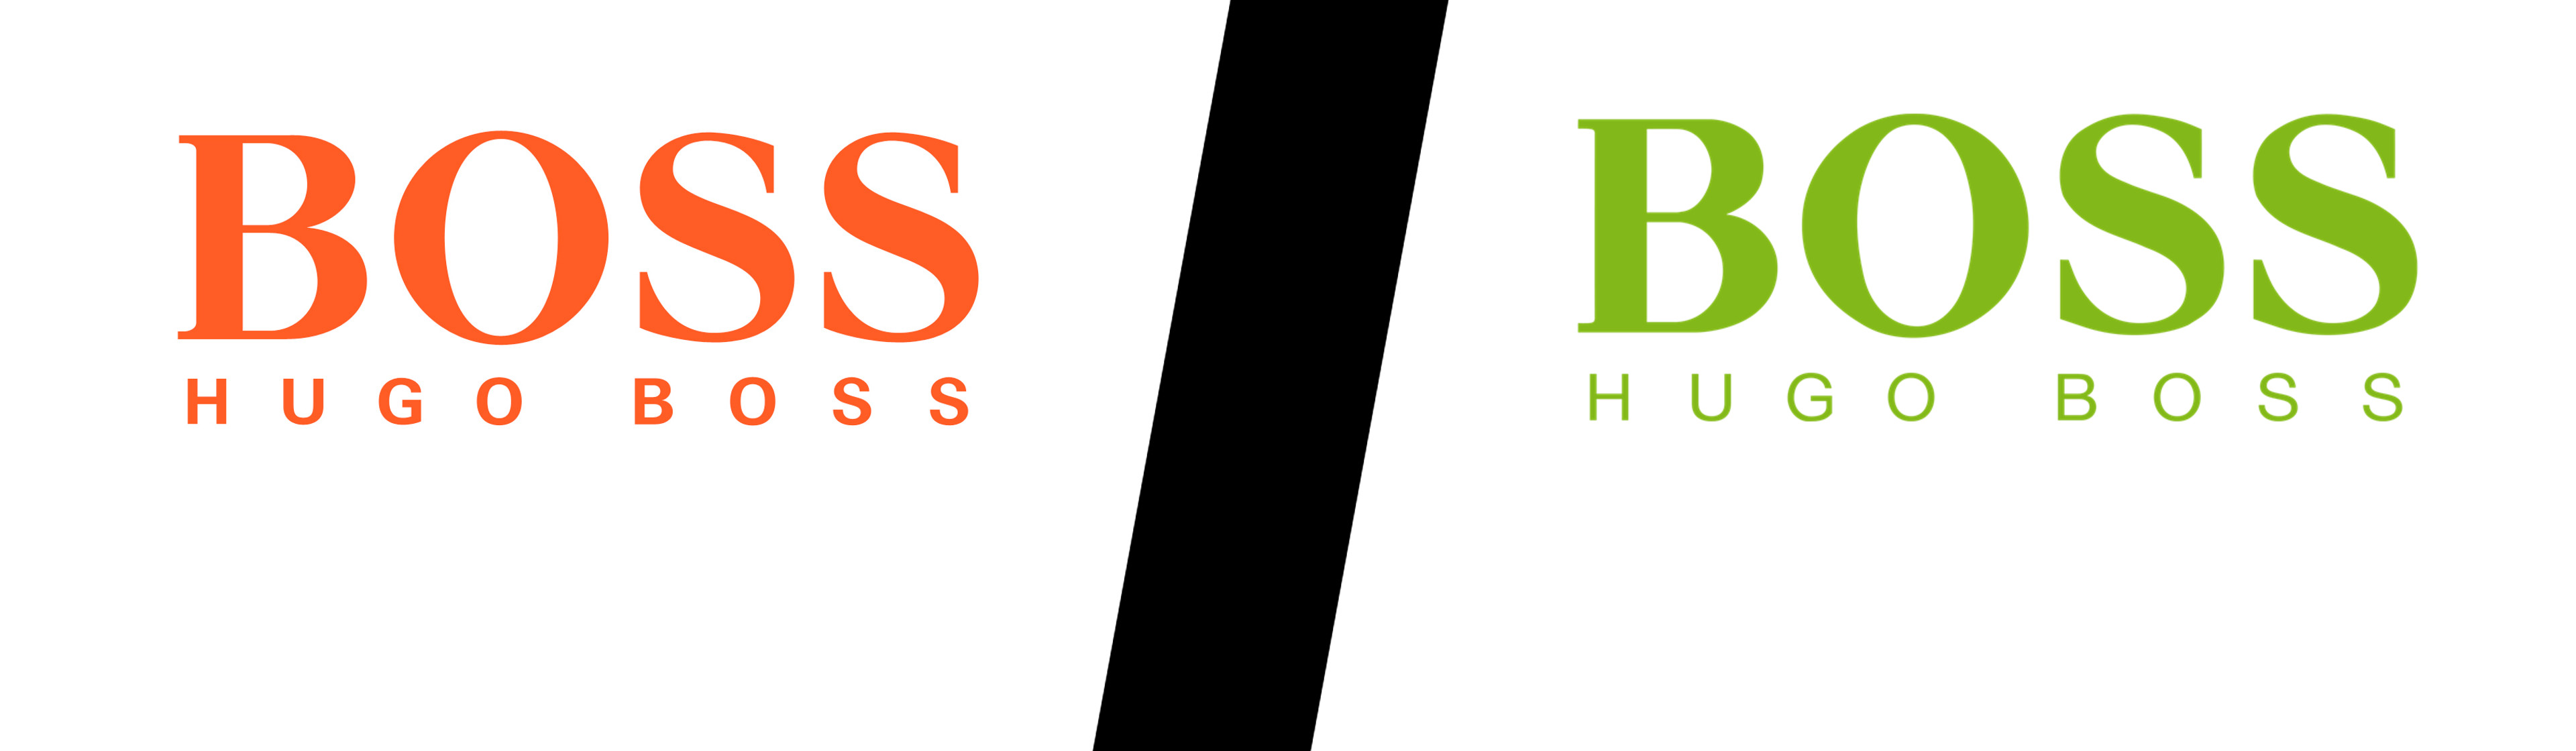 Hugo Boss to Drop Boss Orange & Boss Green Brands